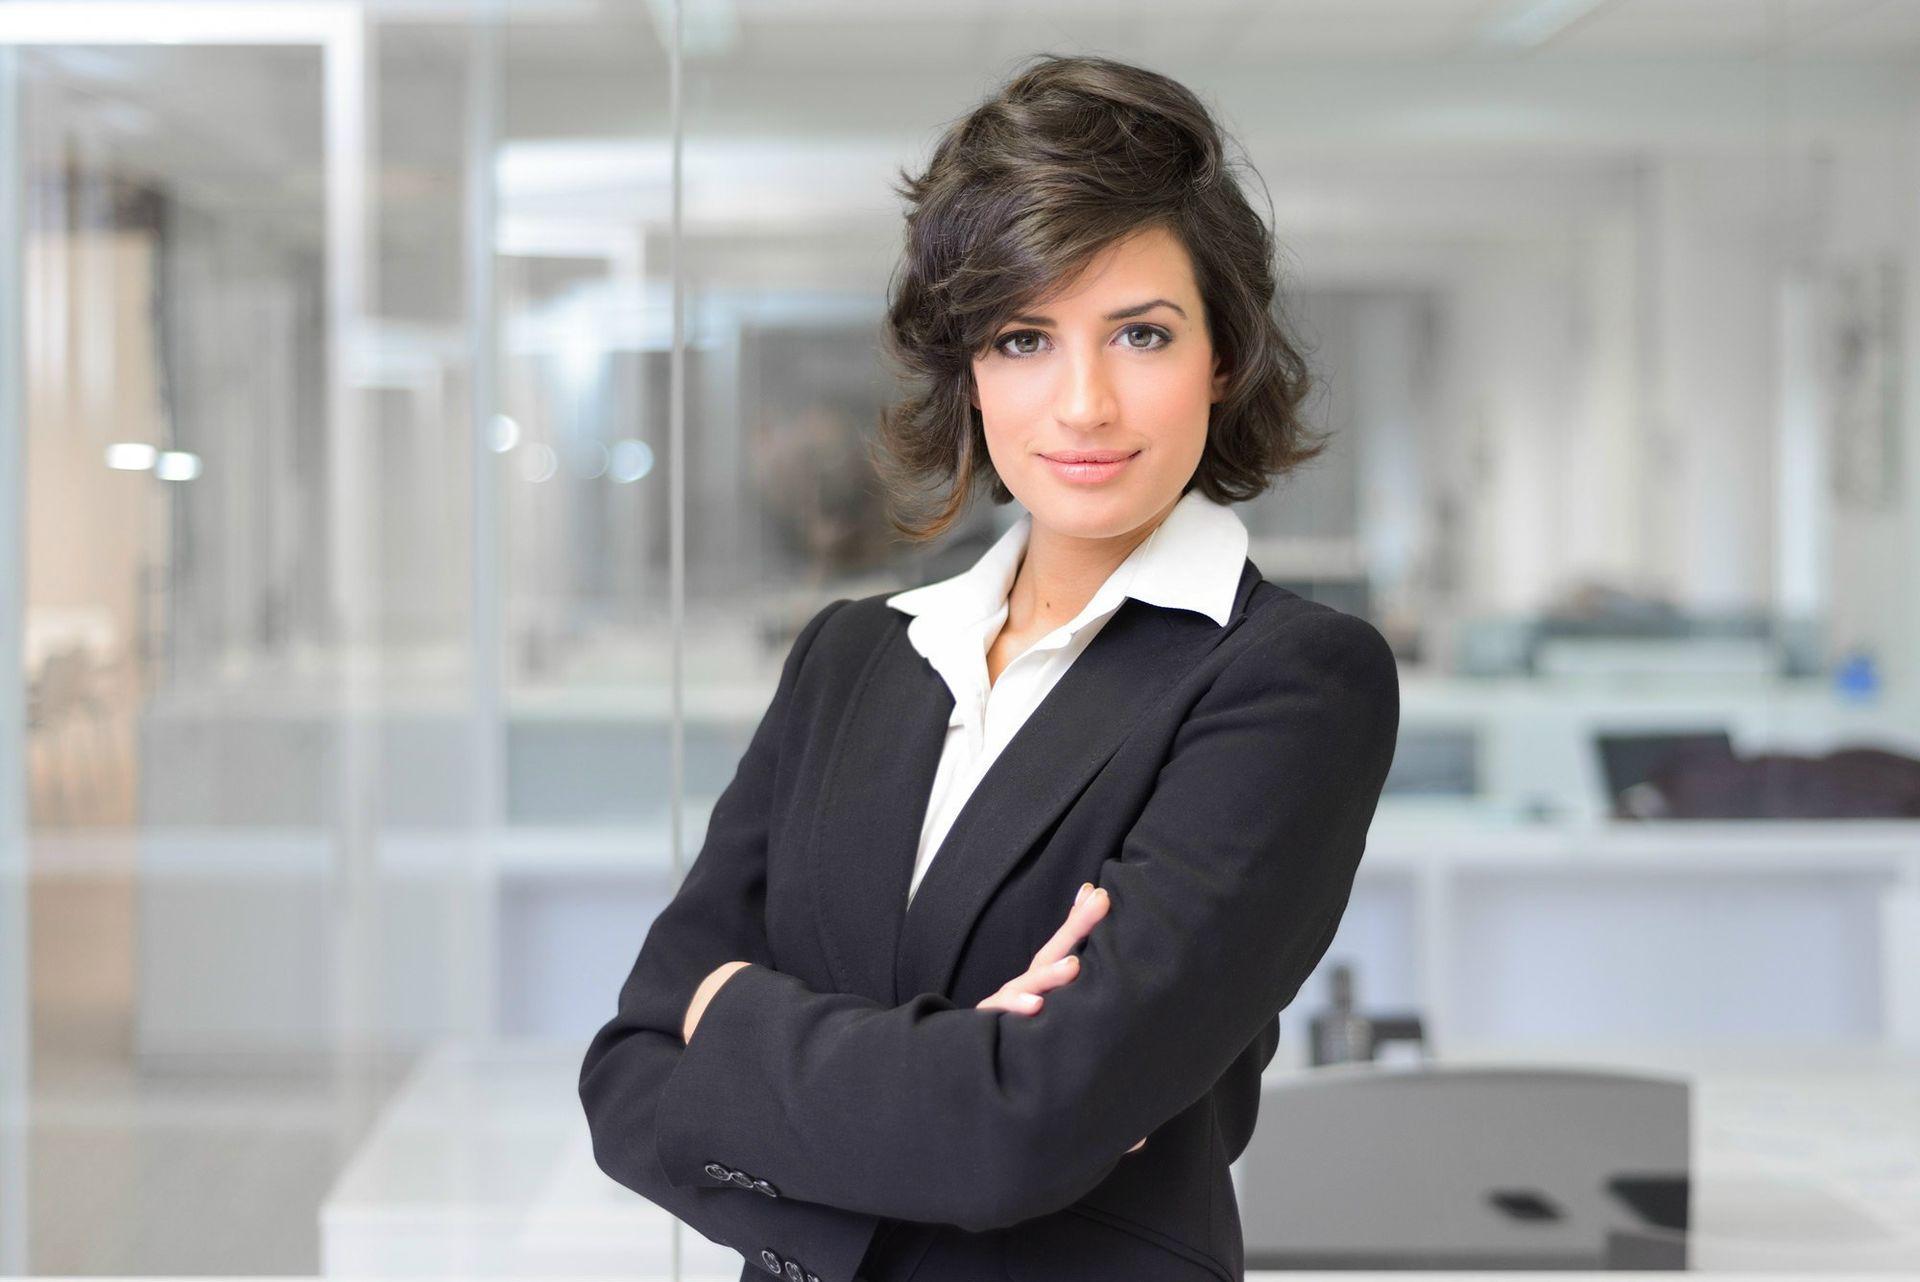 headshots-slide-business-woman